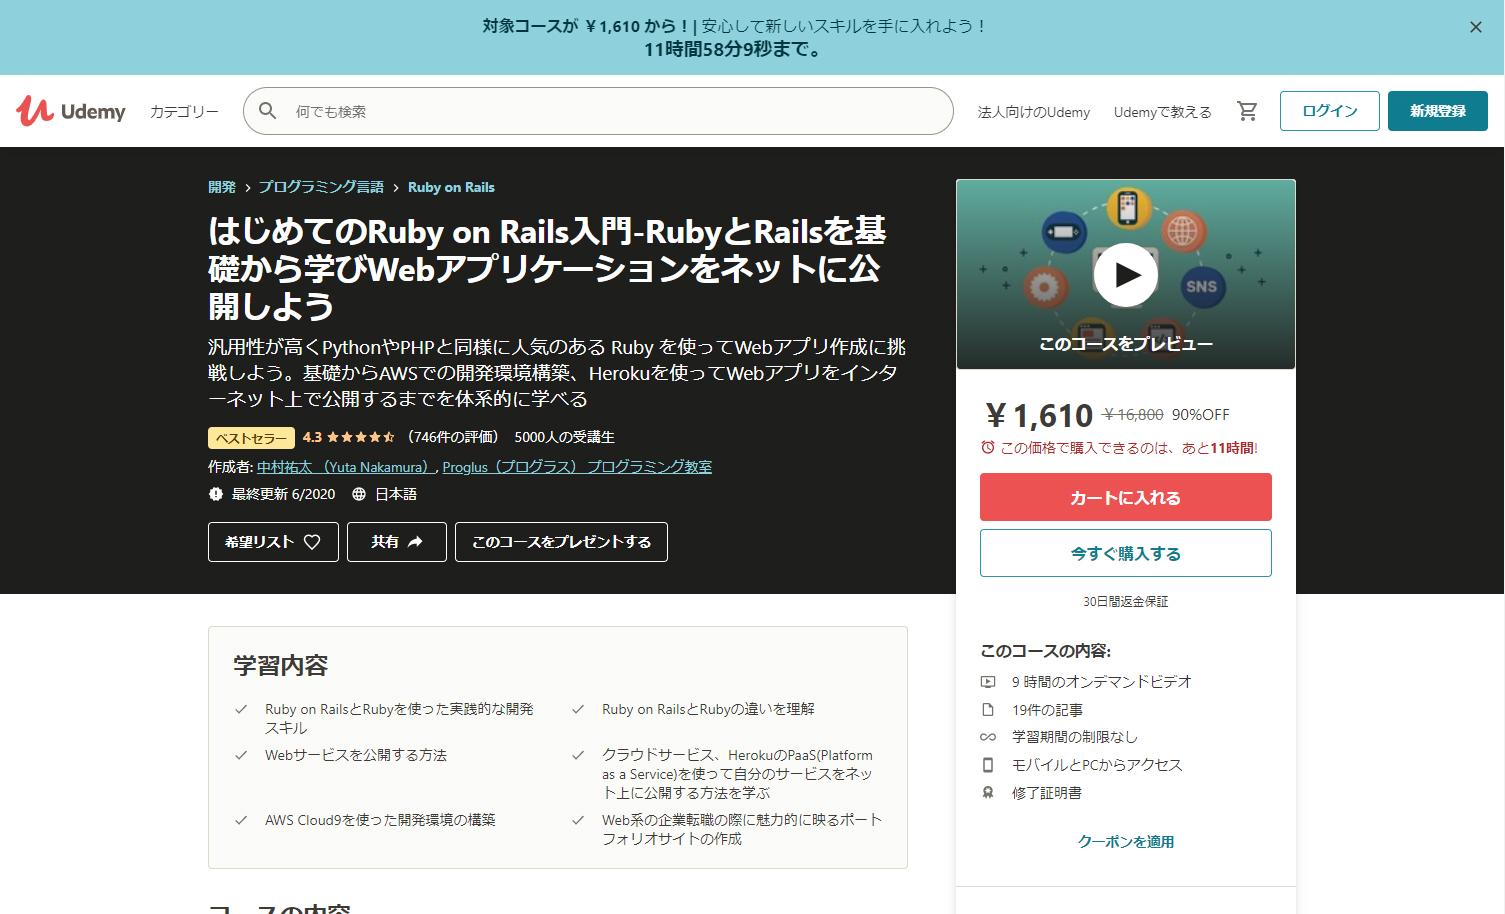 Udemy講座『はじめてのRuby on Rails入門-RubyとRailsを基礎から学びWebアプリケーションをネットに公開しよう』